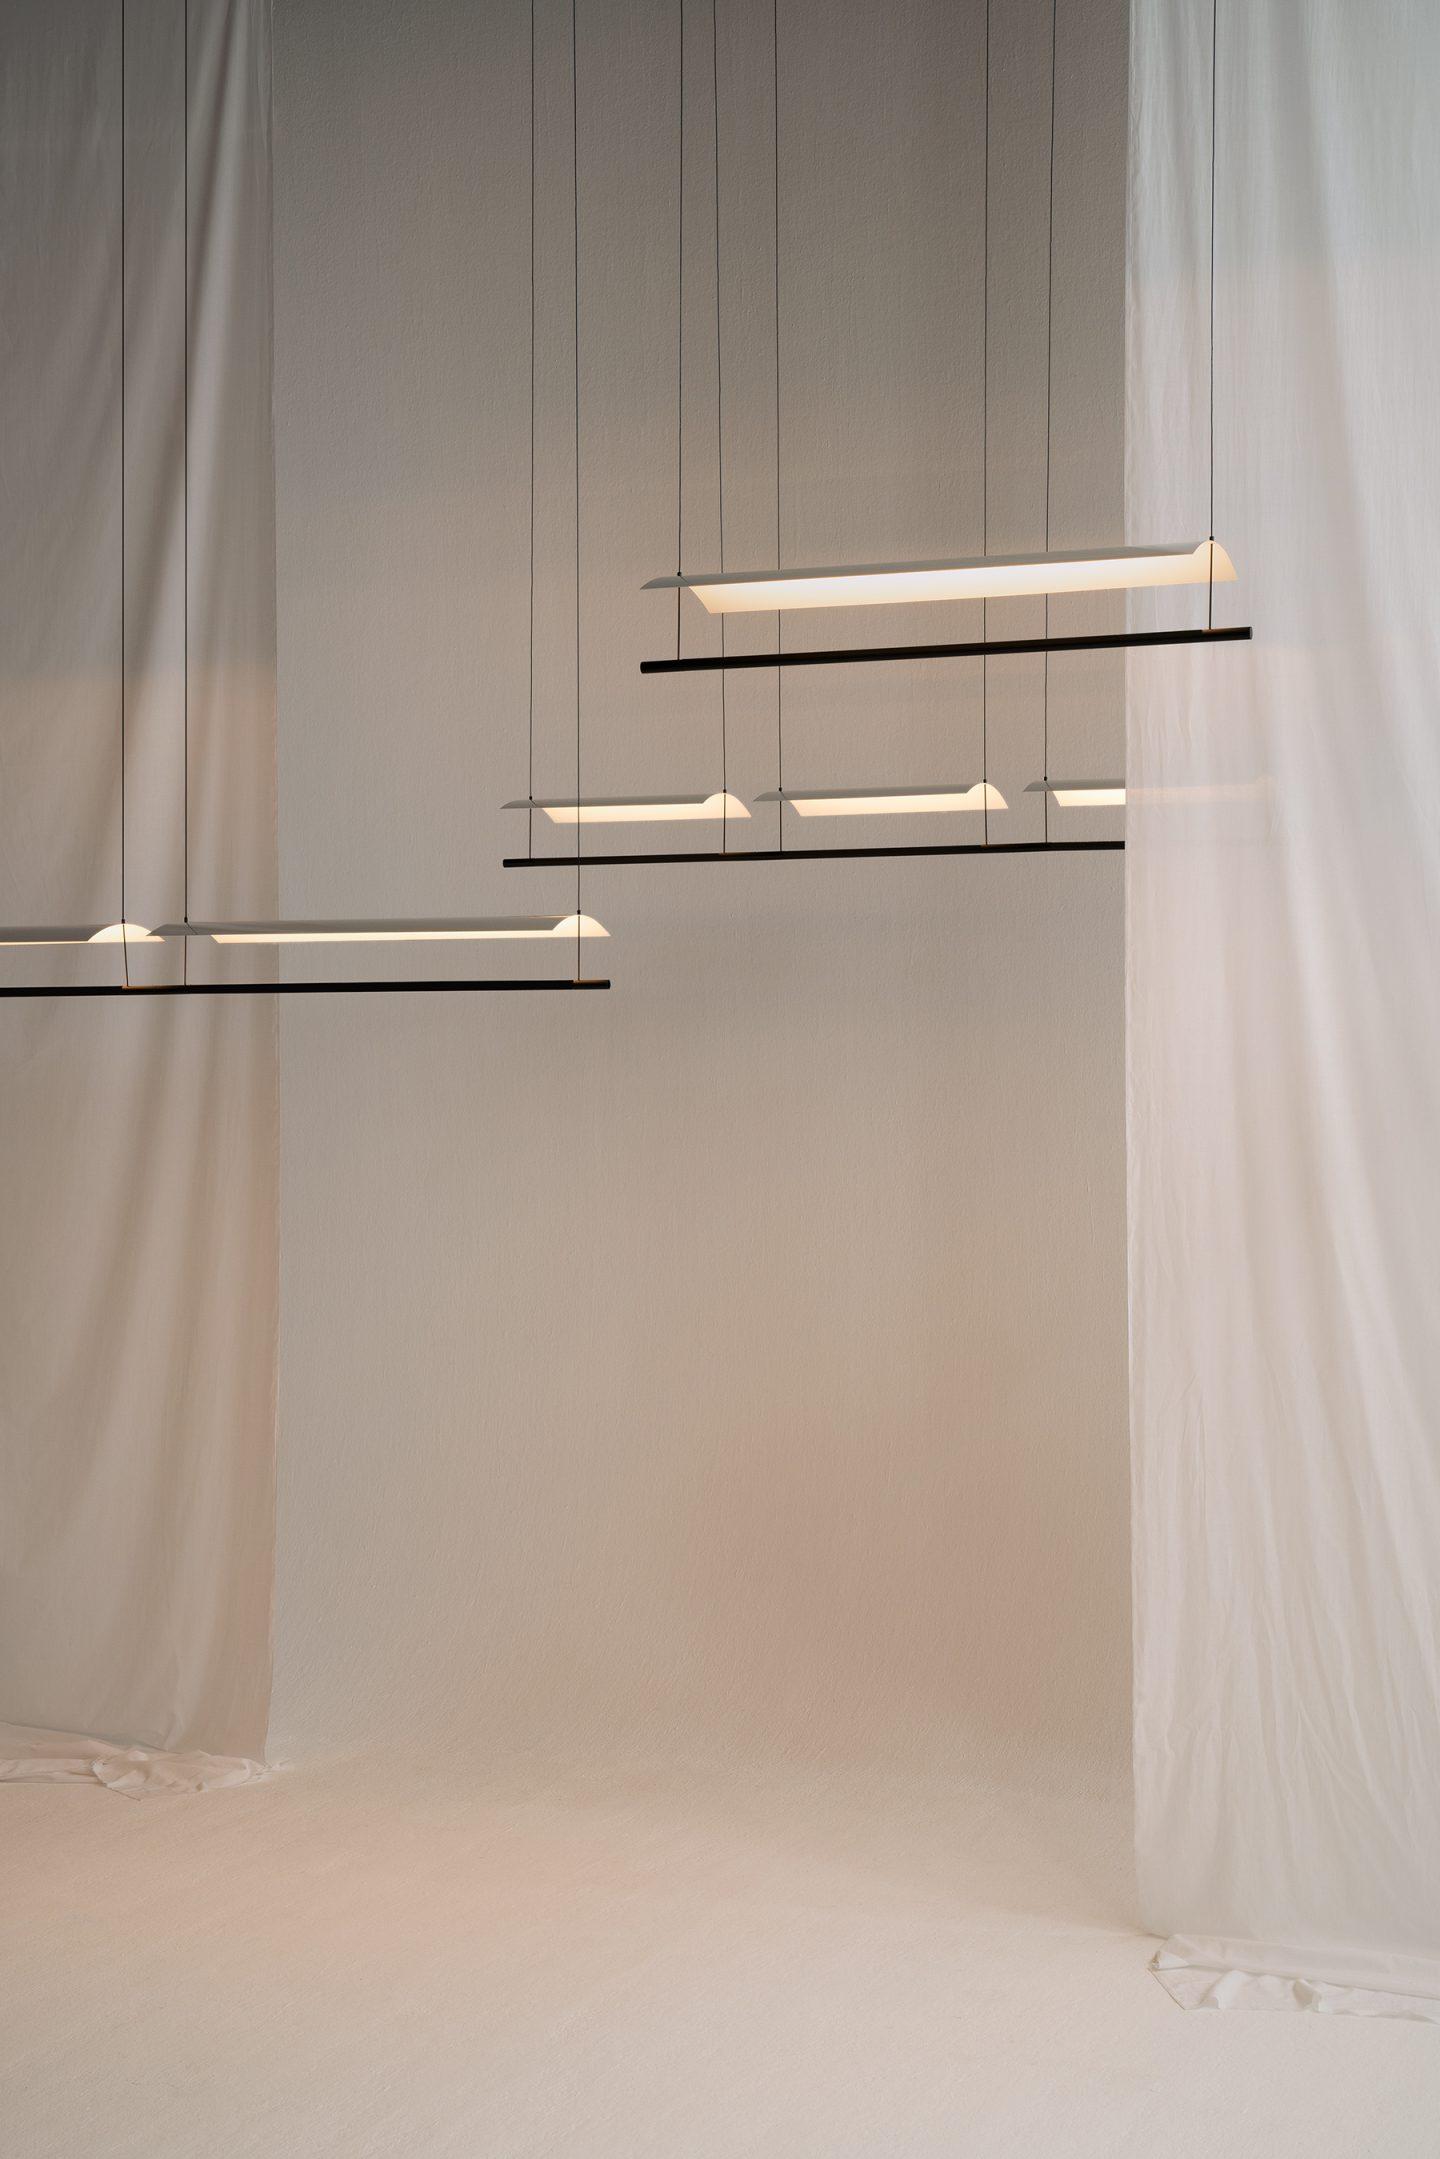 IGNANT-Design-SantaCole-AntoniArola-Lamina-14